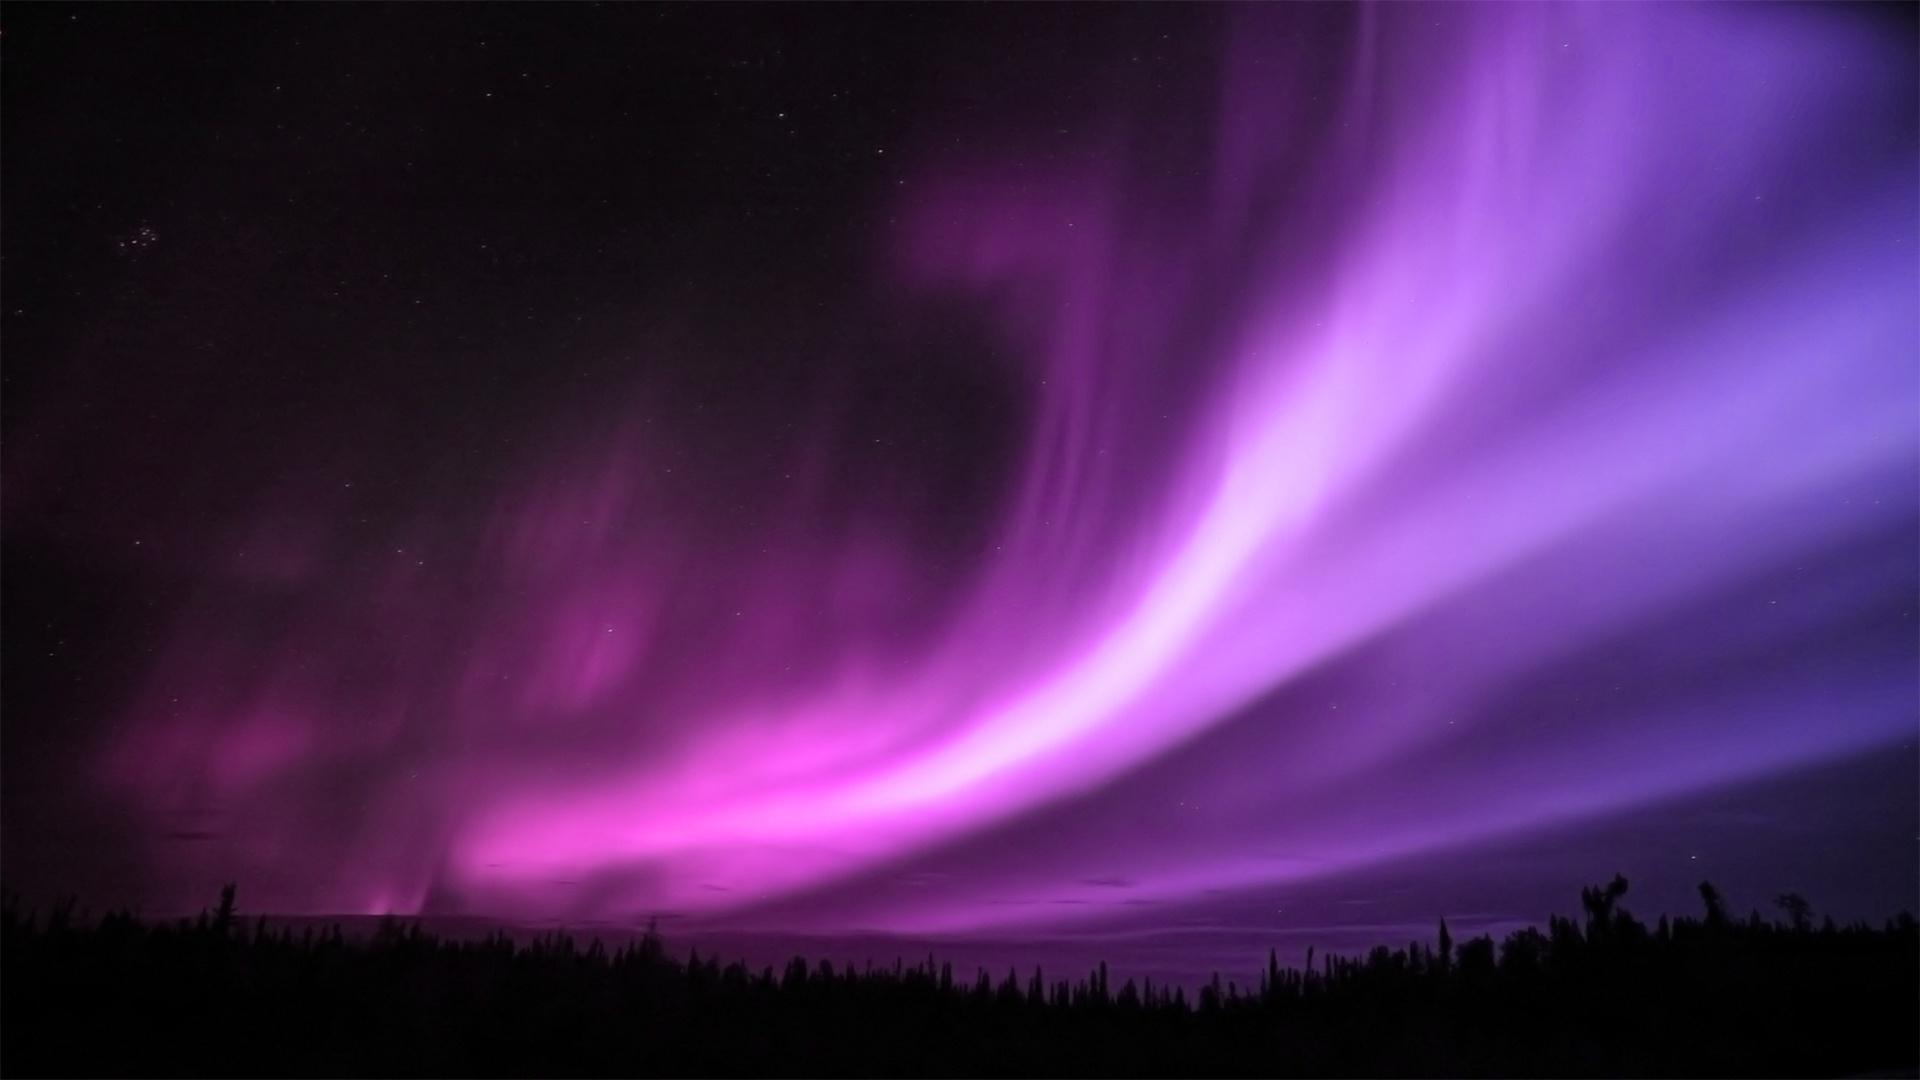 Purple Aurora Borealis Wallpapers HD Wallpapers 1920x1080